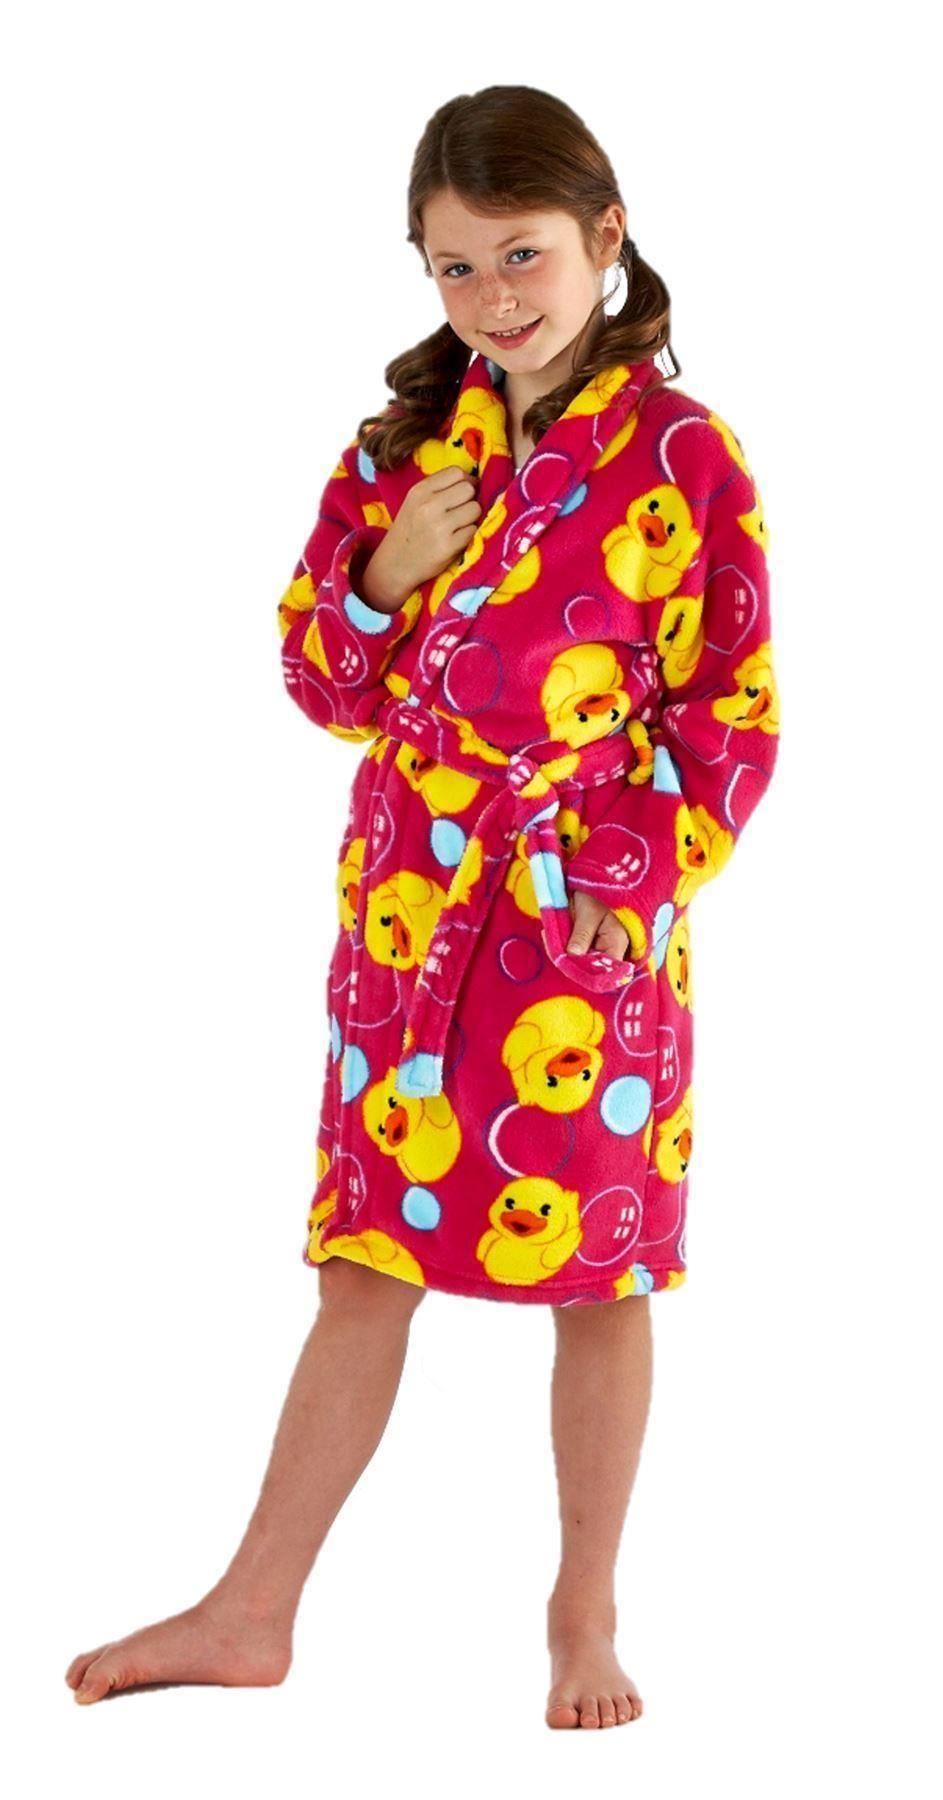 robe de chambre peignoir fille 7 8 9 10 1 12 13 ans super. Black Bedroom Furniture Sets. Home Design Ideas